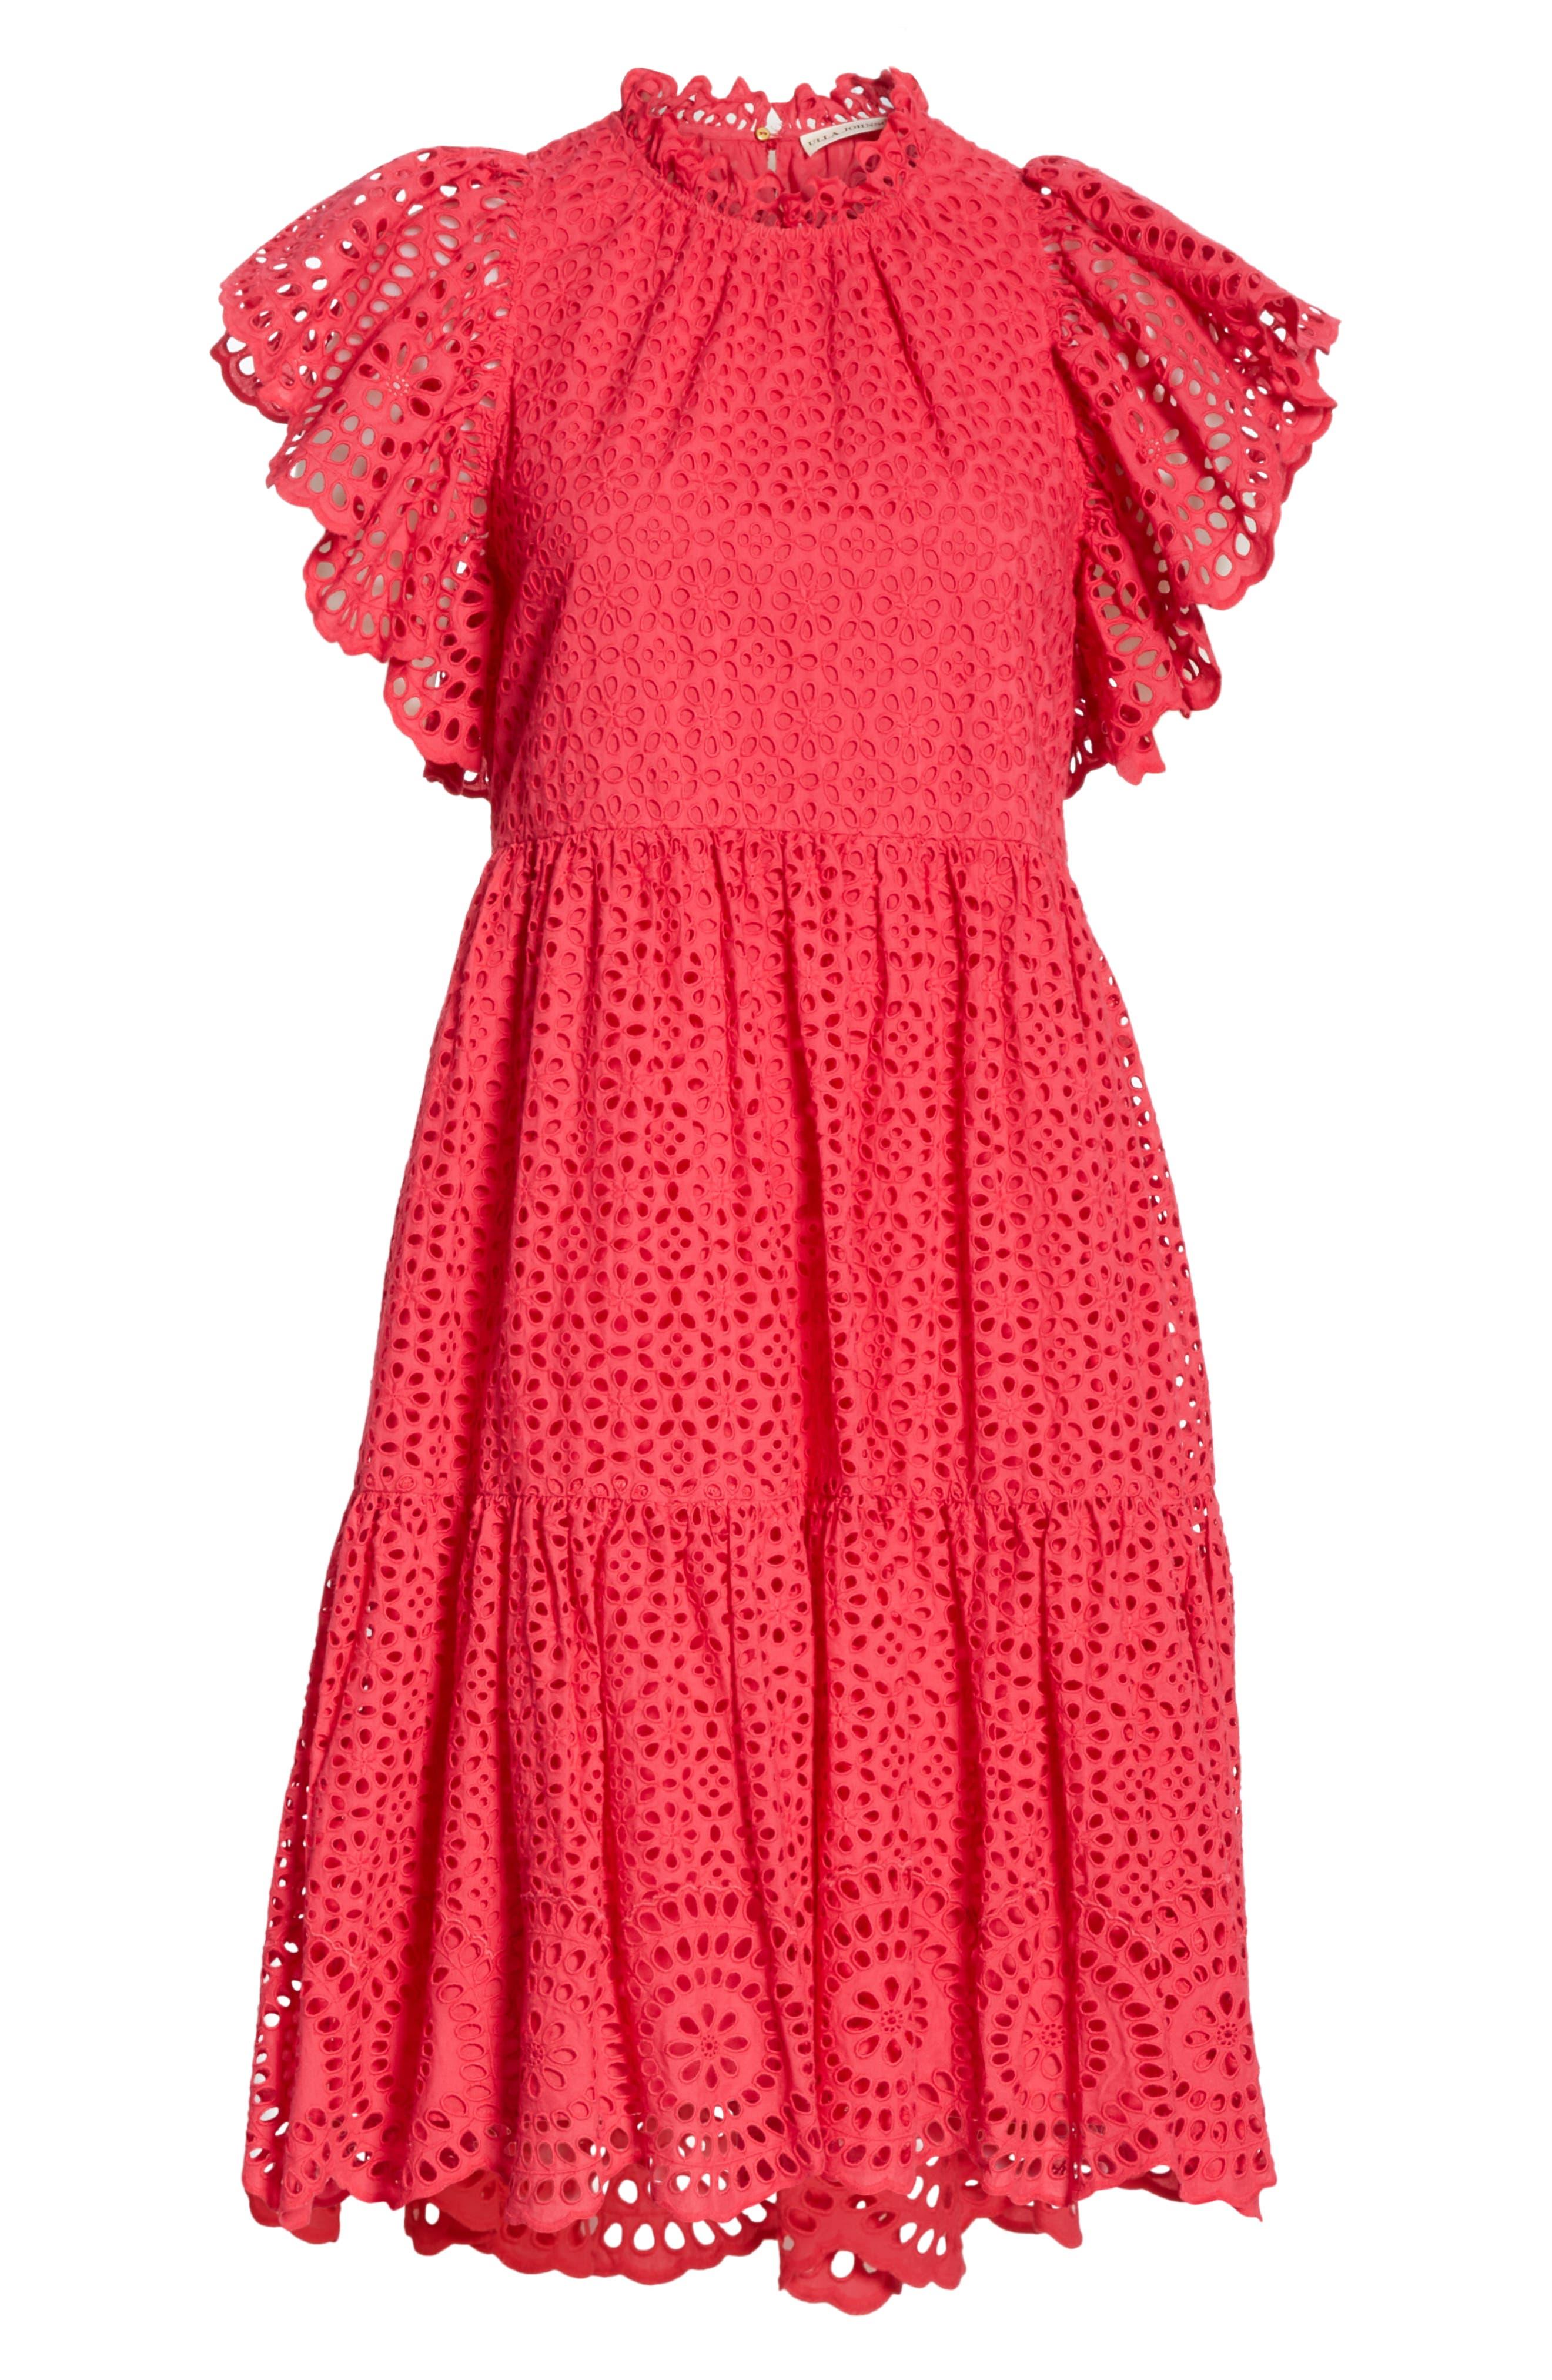 ULLA JOHNSON, Norah Eyelet Dress, Alternate thumbnail 7, color, FUCHSIA